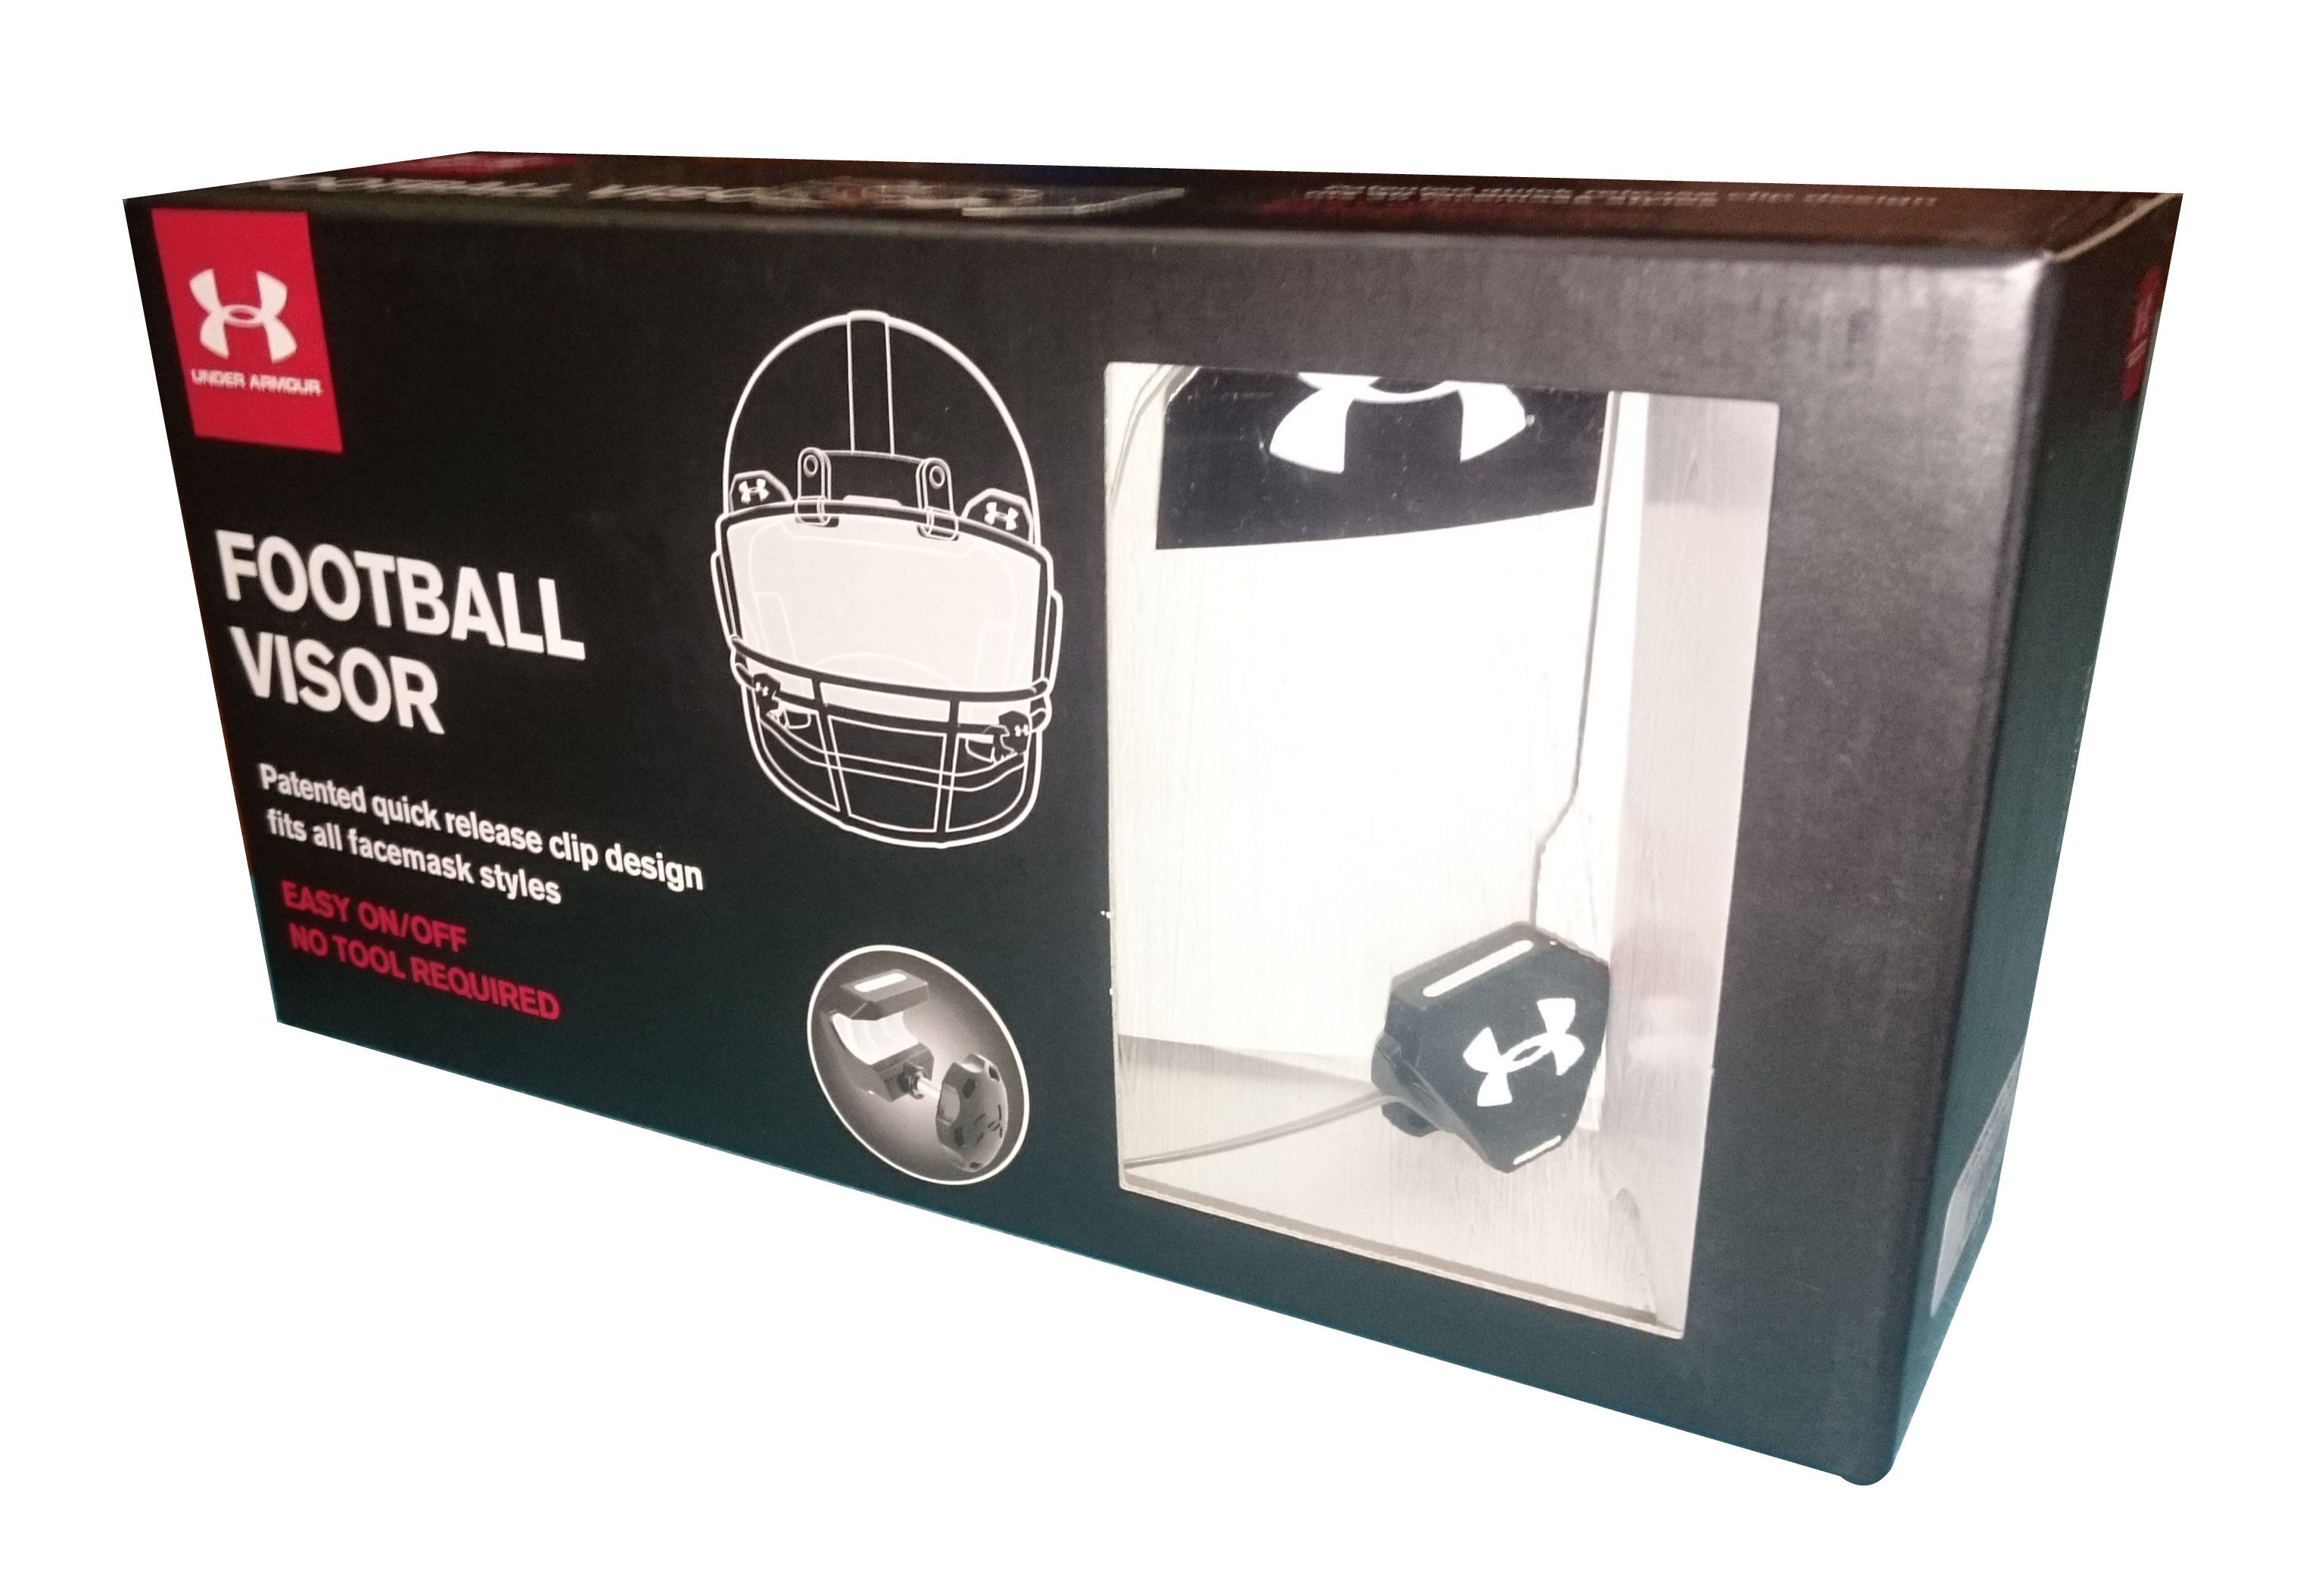 UNDERARMOUR PRO FOOTBALL VISOR